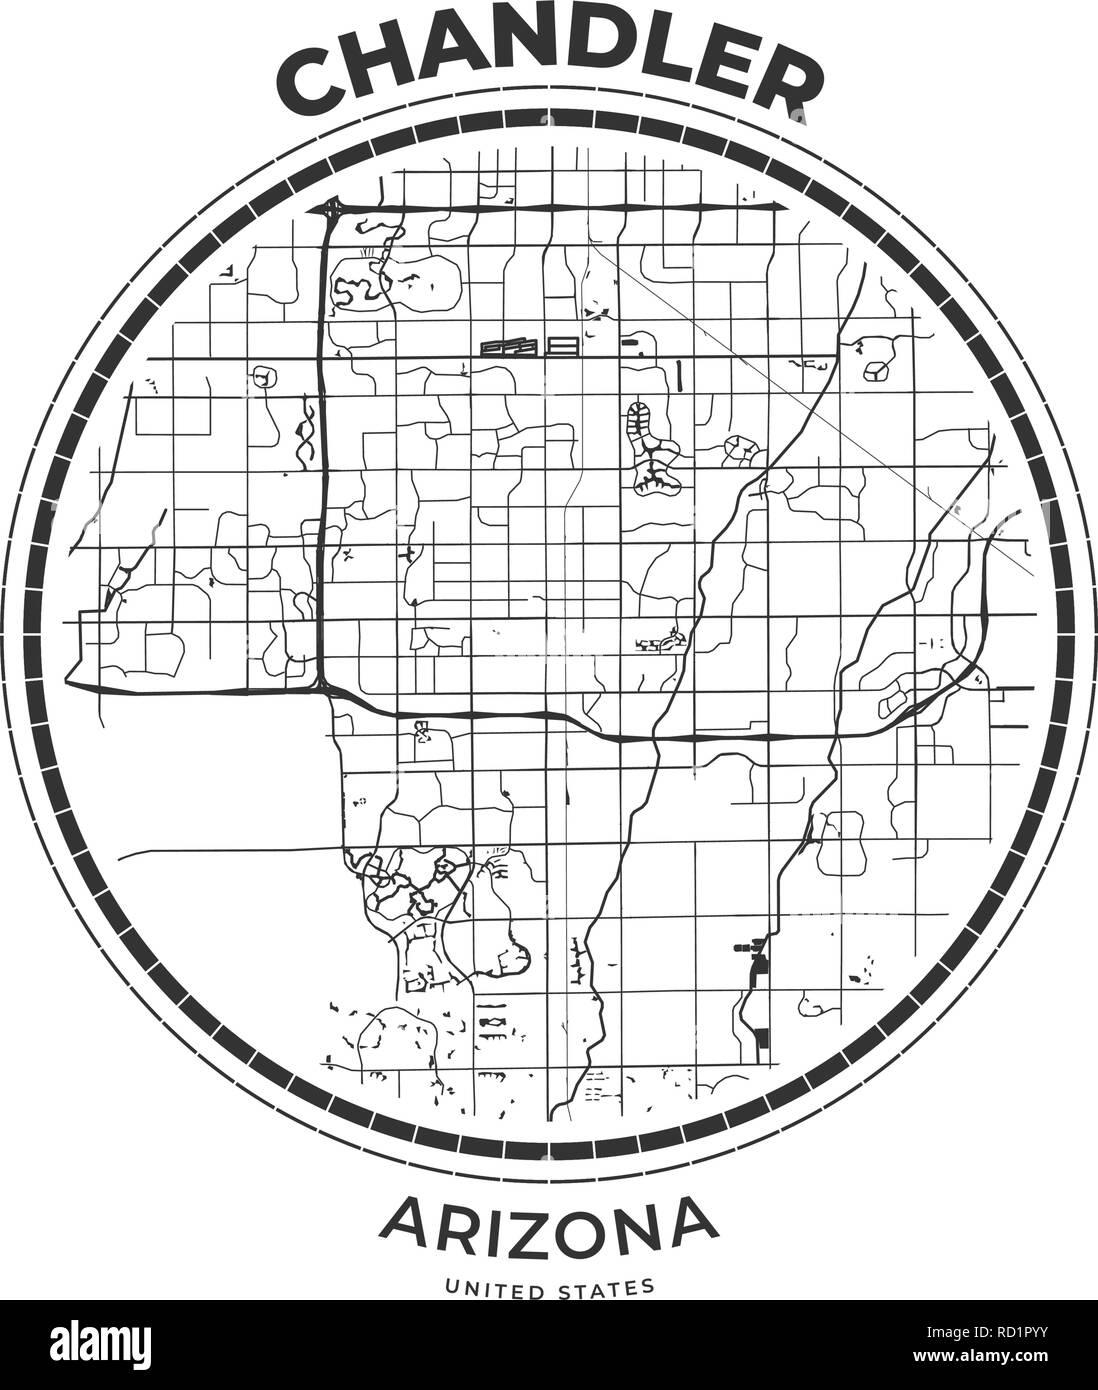 T-shirt map badge of Chandler, Arizona. Tee shirt print ... on santa fe arizona map, tempe arizona map, atlanta arizona map, rainbow valley arizona map, riverside arizona map, boise arizona map, dragoon arizona map, klondyke arizona map, tent city arizona map, secret canyon arizona map, jackson arizona map, mesquite arizona map, wittmann arizona map, many farms arizona map, elfrida arizona map, reno arizona map, perry high school arizona map, humboldt arizona map, wilson arizona map, havasu city arizona map,